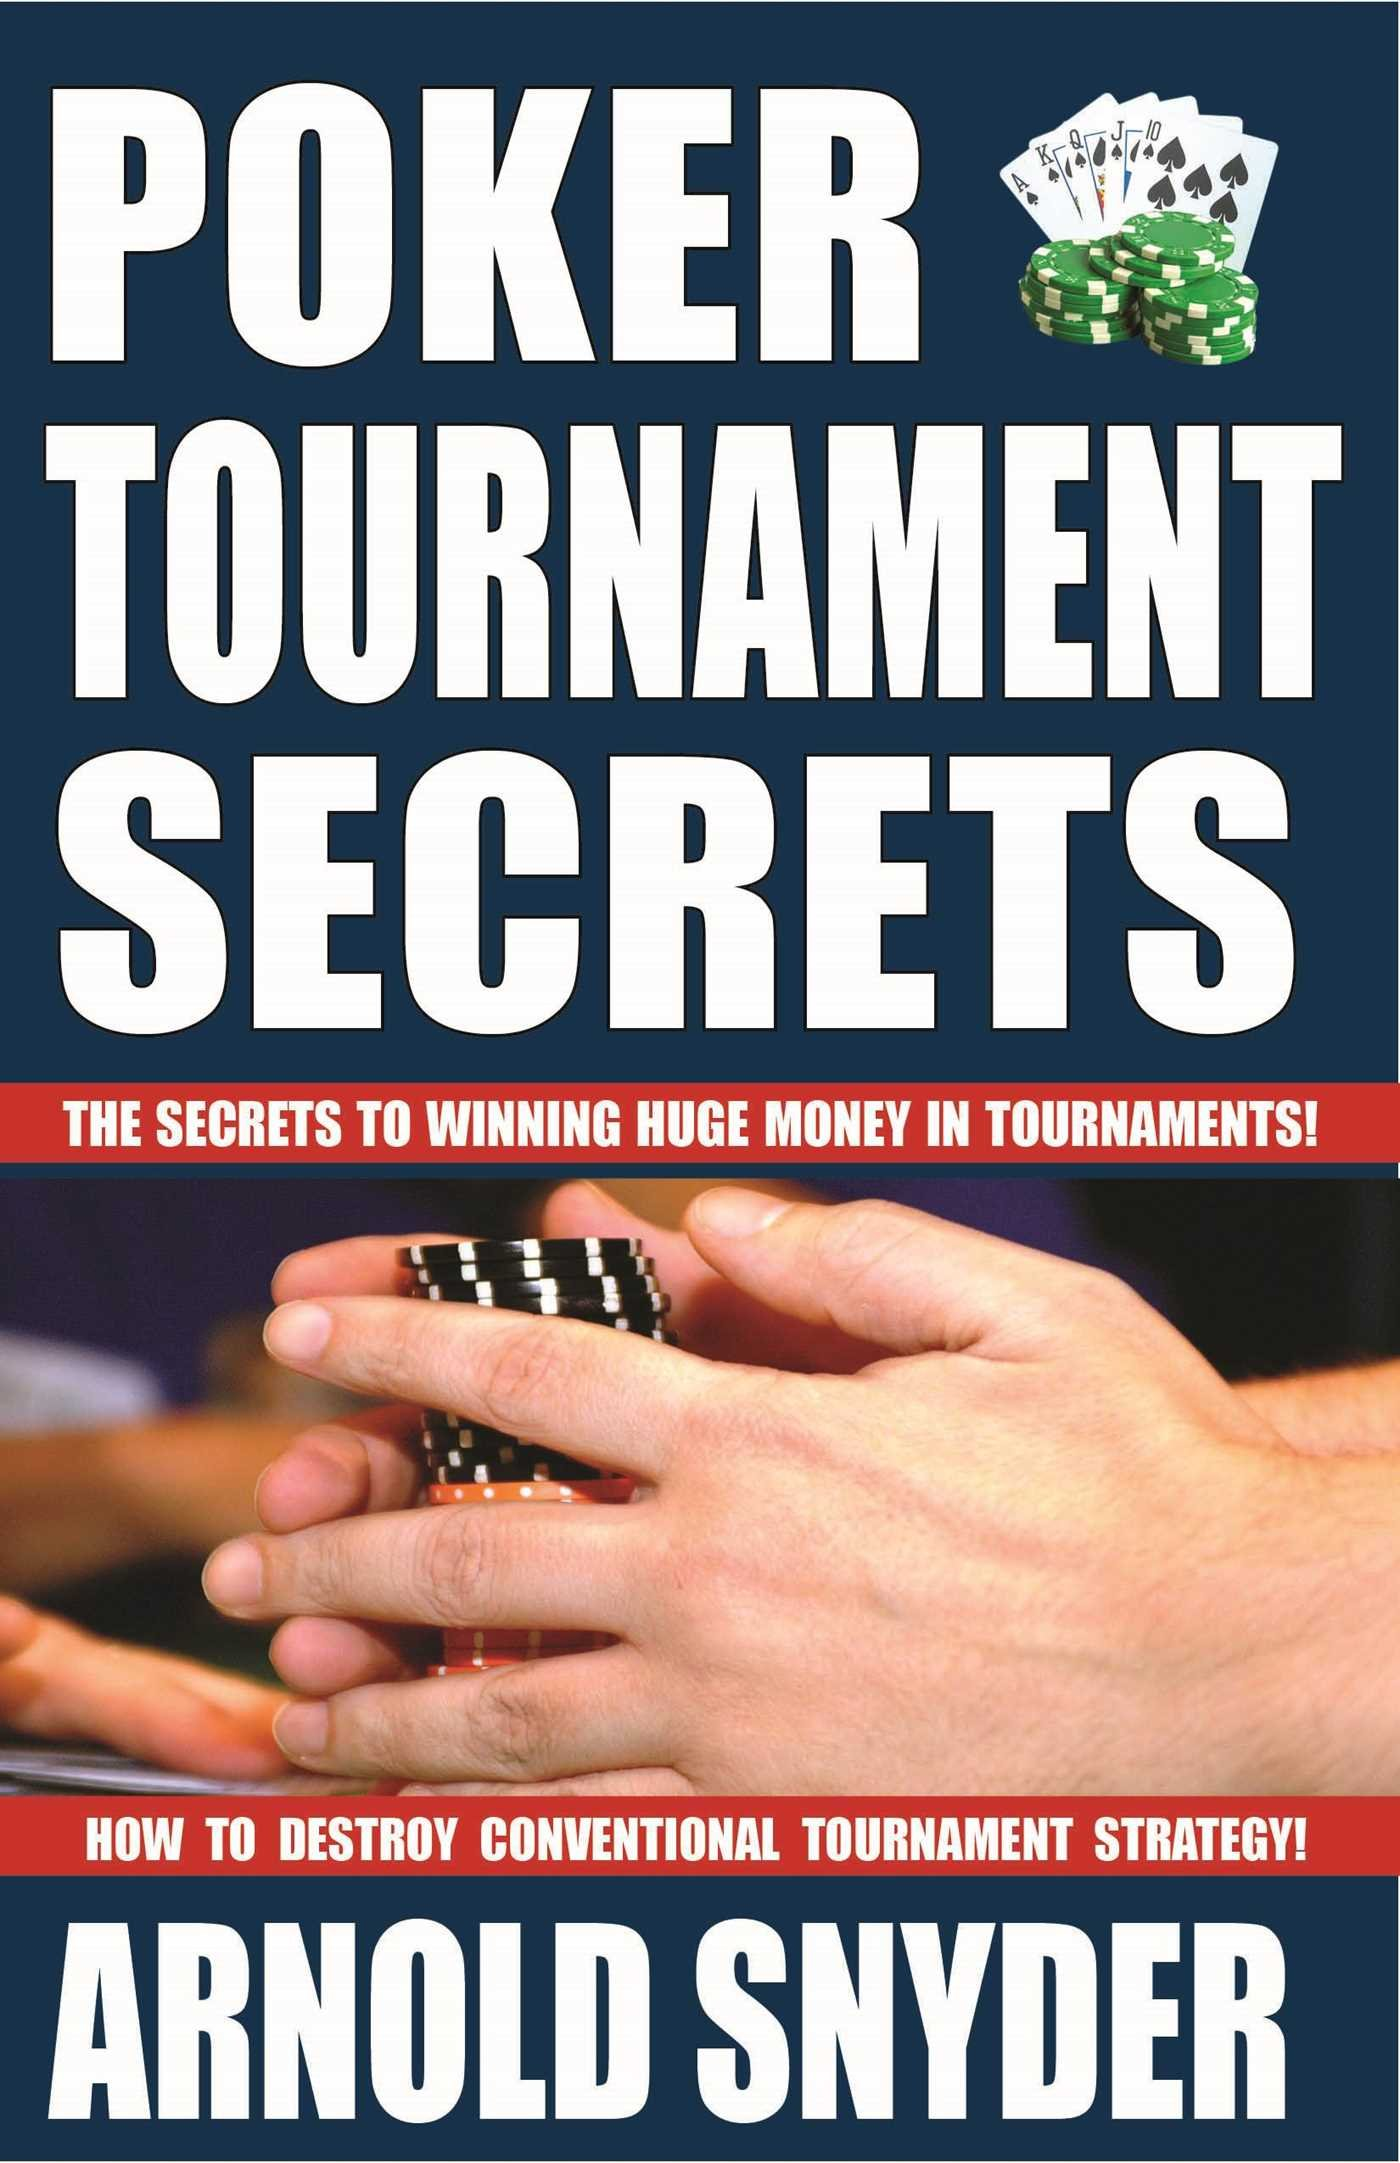 Poker Tournament Secrets Arnold Snyder 9781580423427 Amazon Com